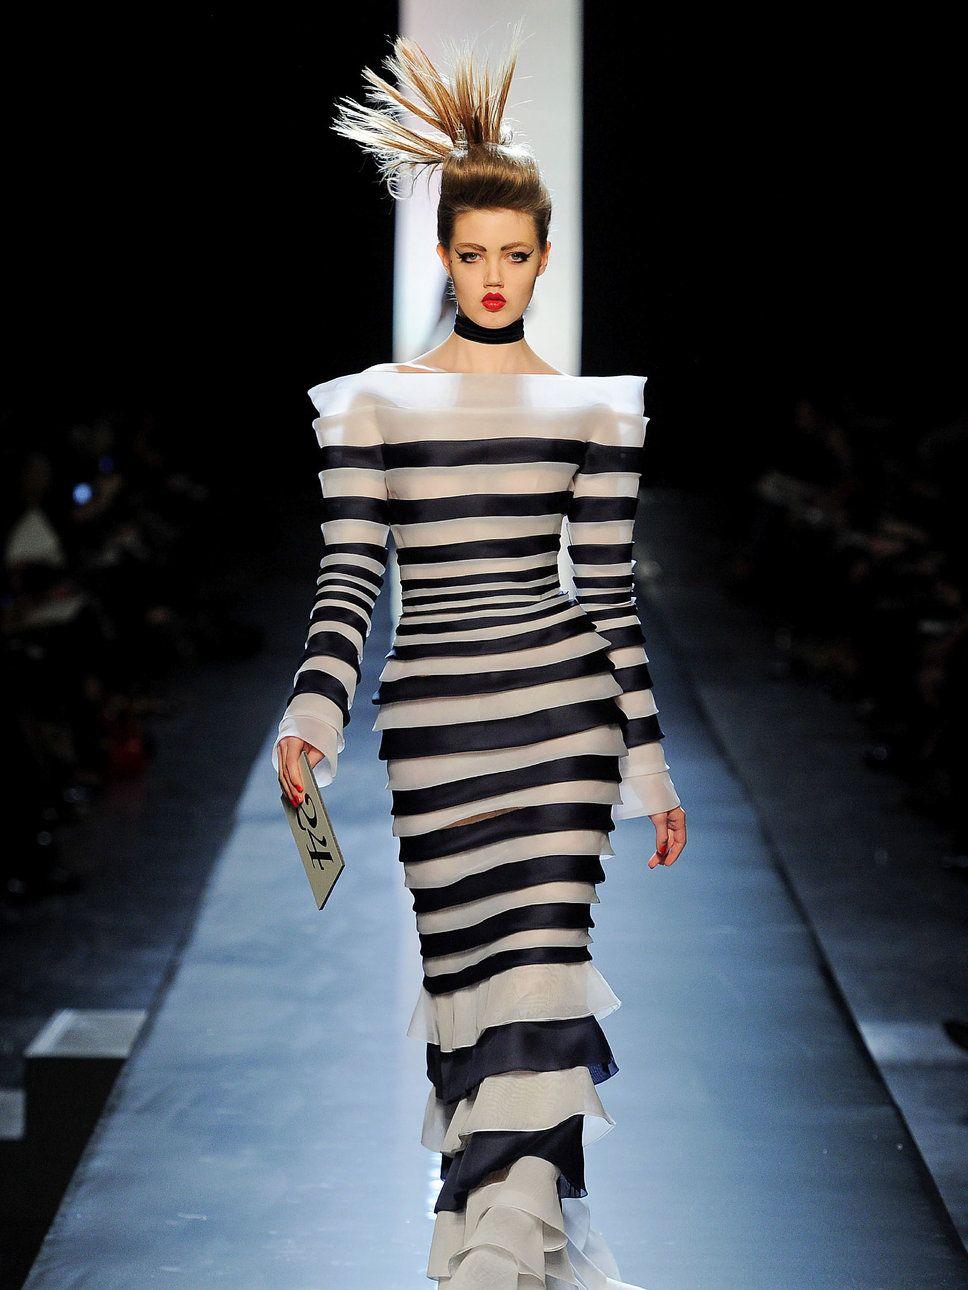 Pin By Johanna Dalland On My Unique Style Fashion Weird Fashion My Unique Style